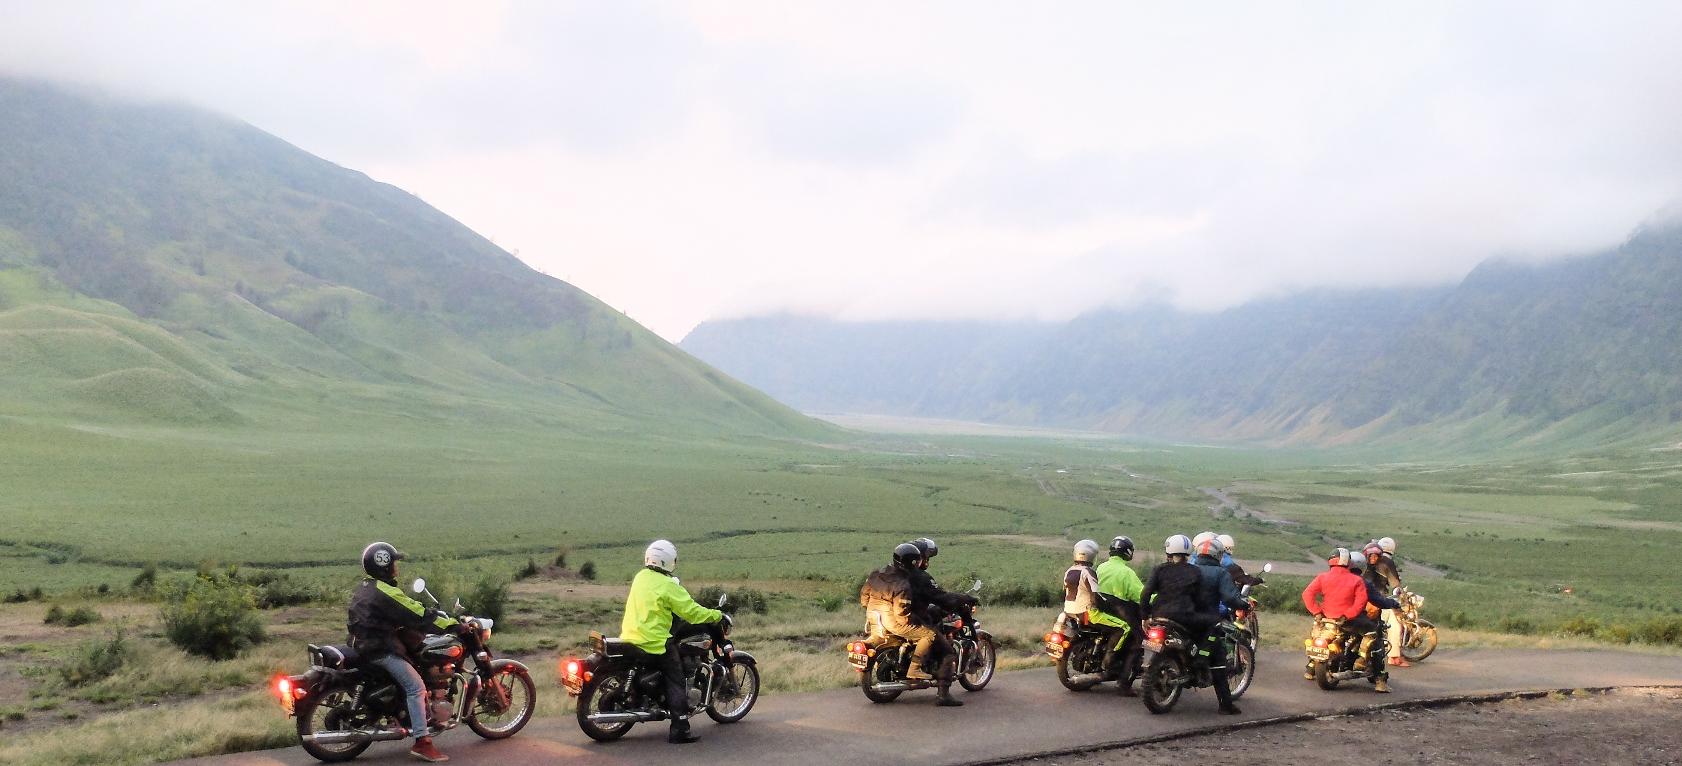 Java Motorbike Tour Indonesia